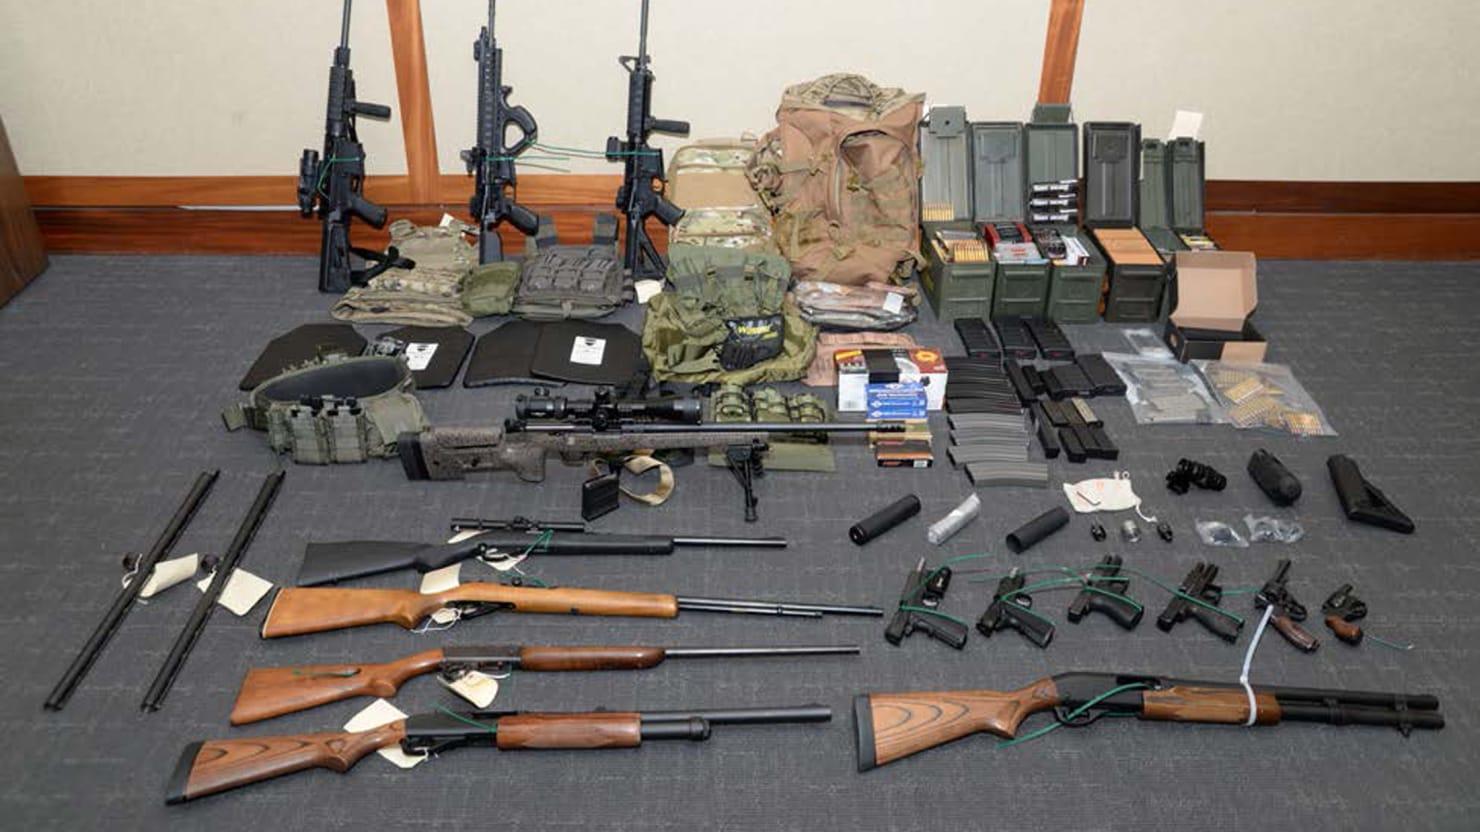 Coast Guard Lieutenant Plotted Terror Attacks High on Opiates at His Desk: Prosecutors